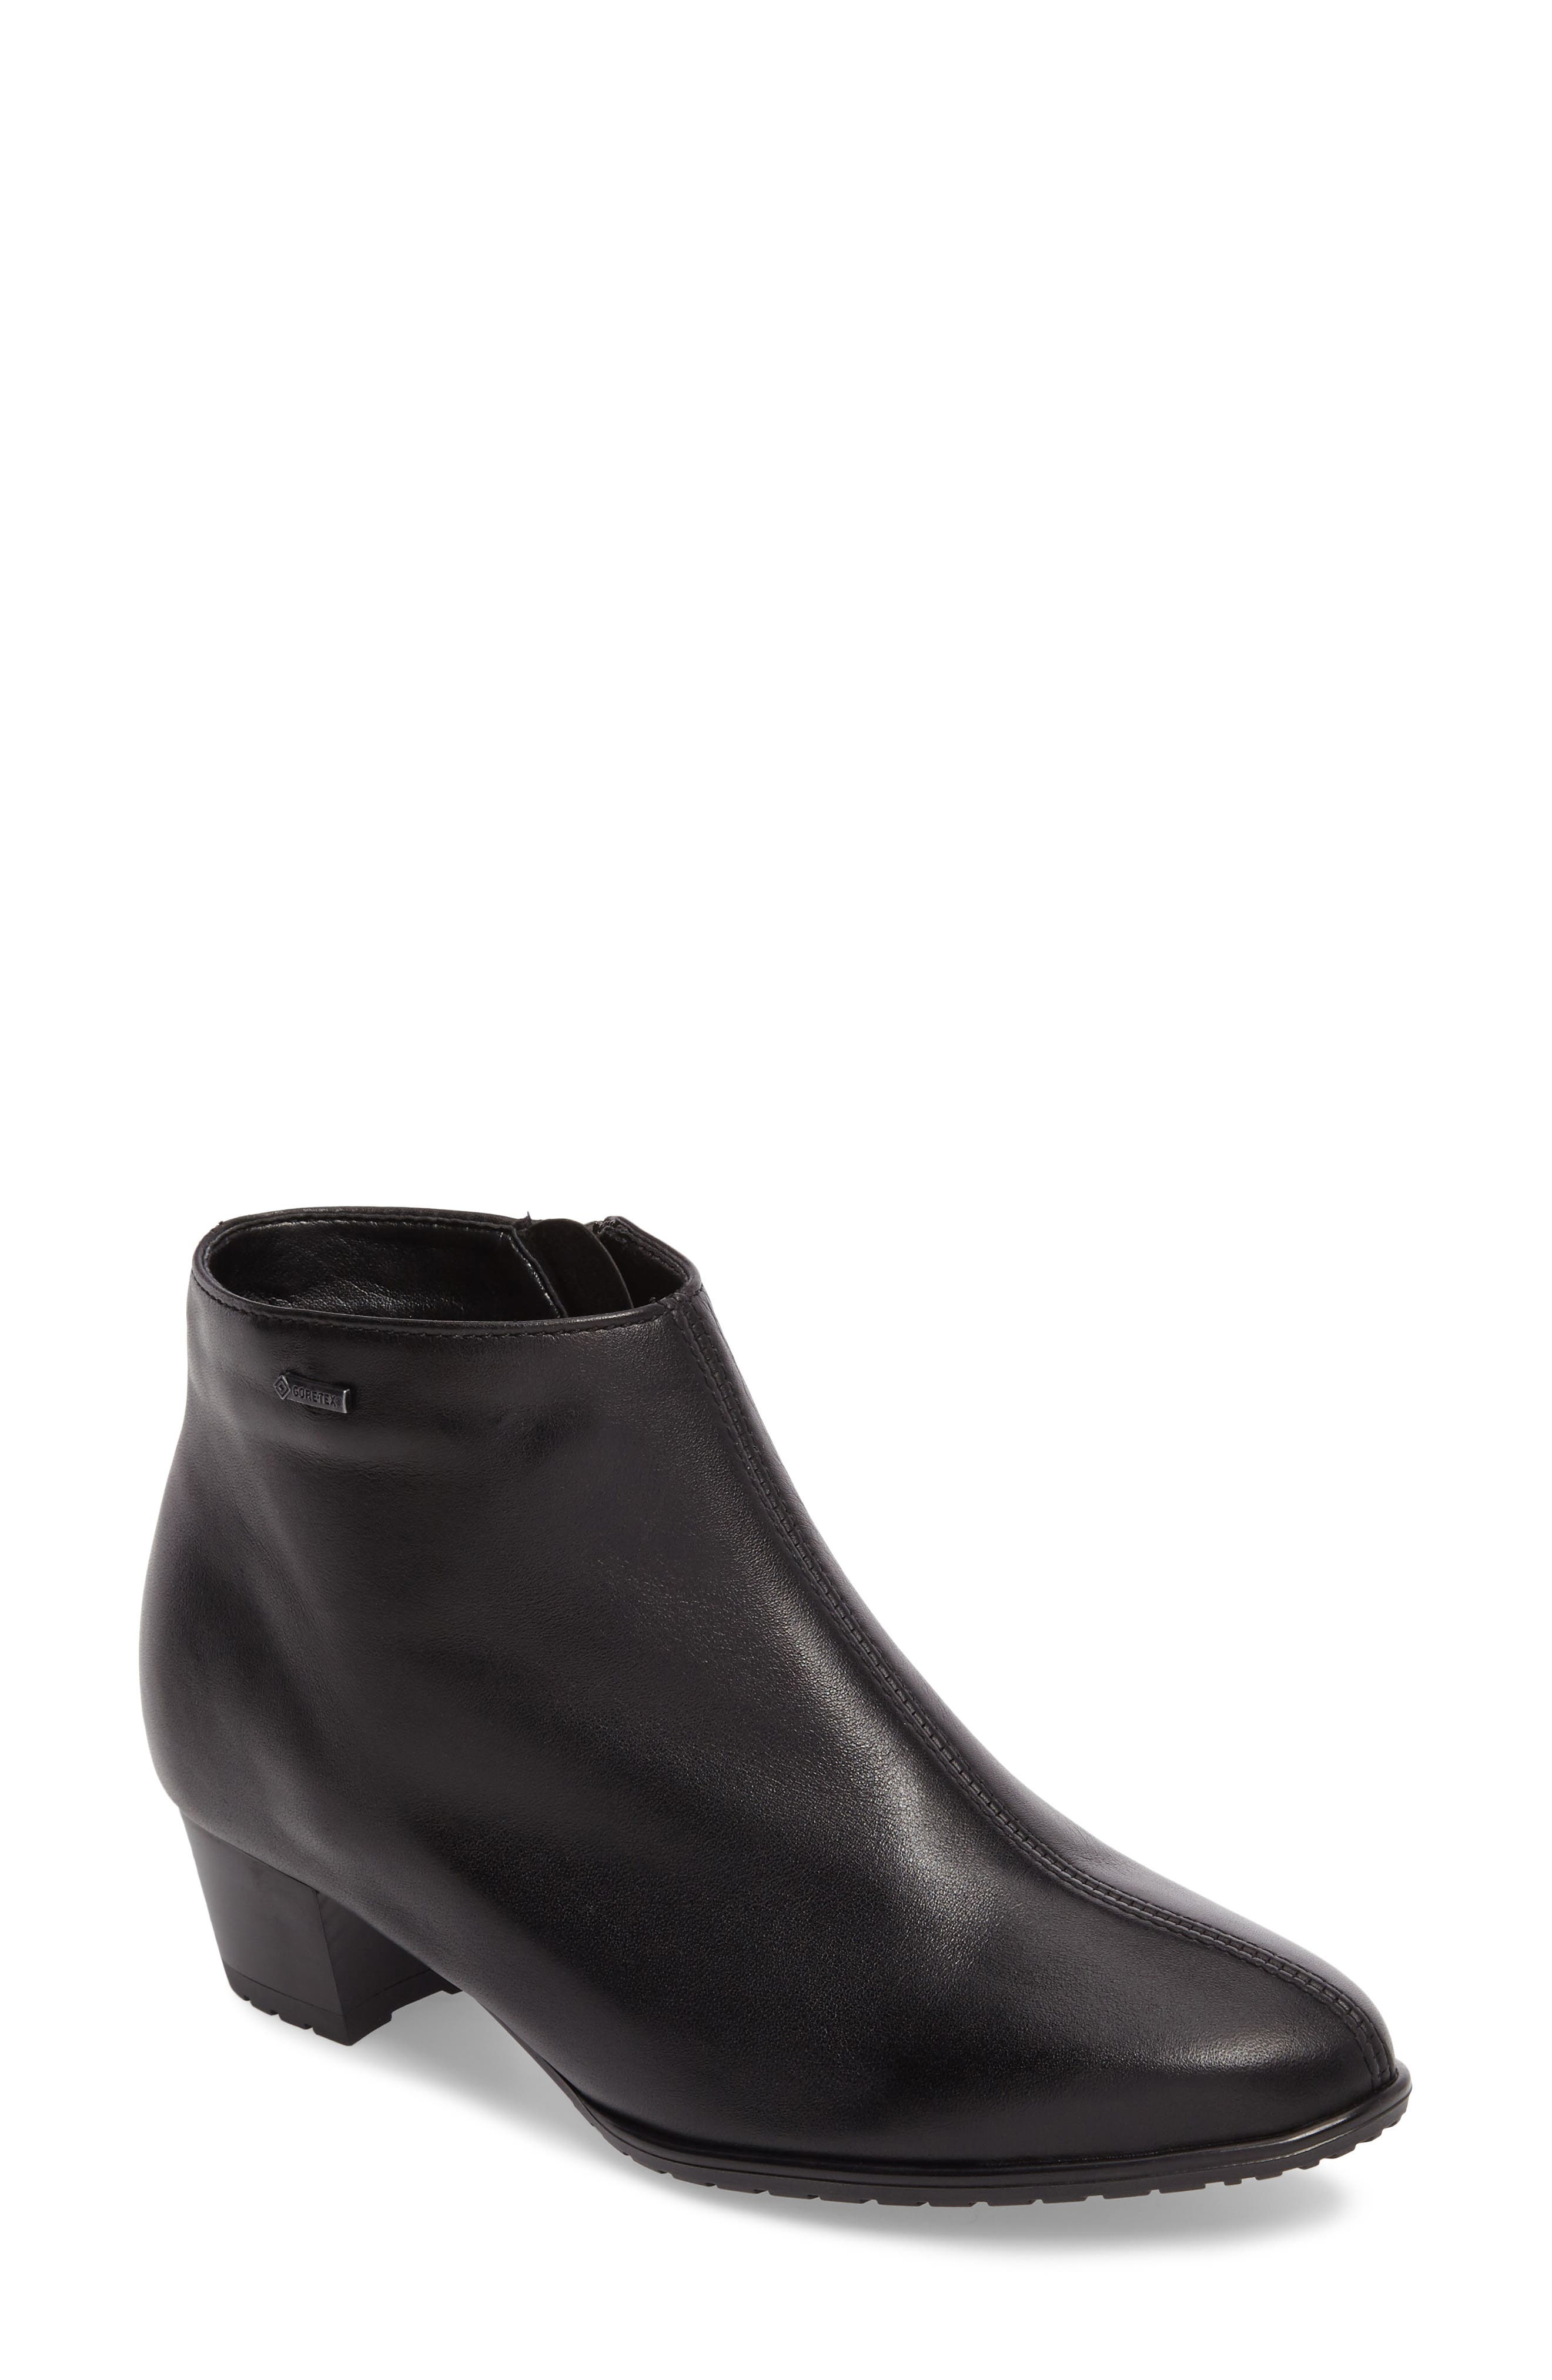 Prisha Waterproof Gore-Tex<sup>®</sup> Bootie,                             Main thumbnail 1, color,                             Black Leather